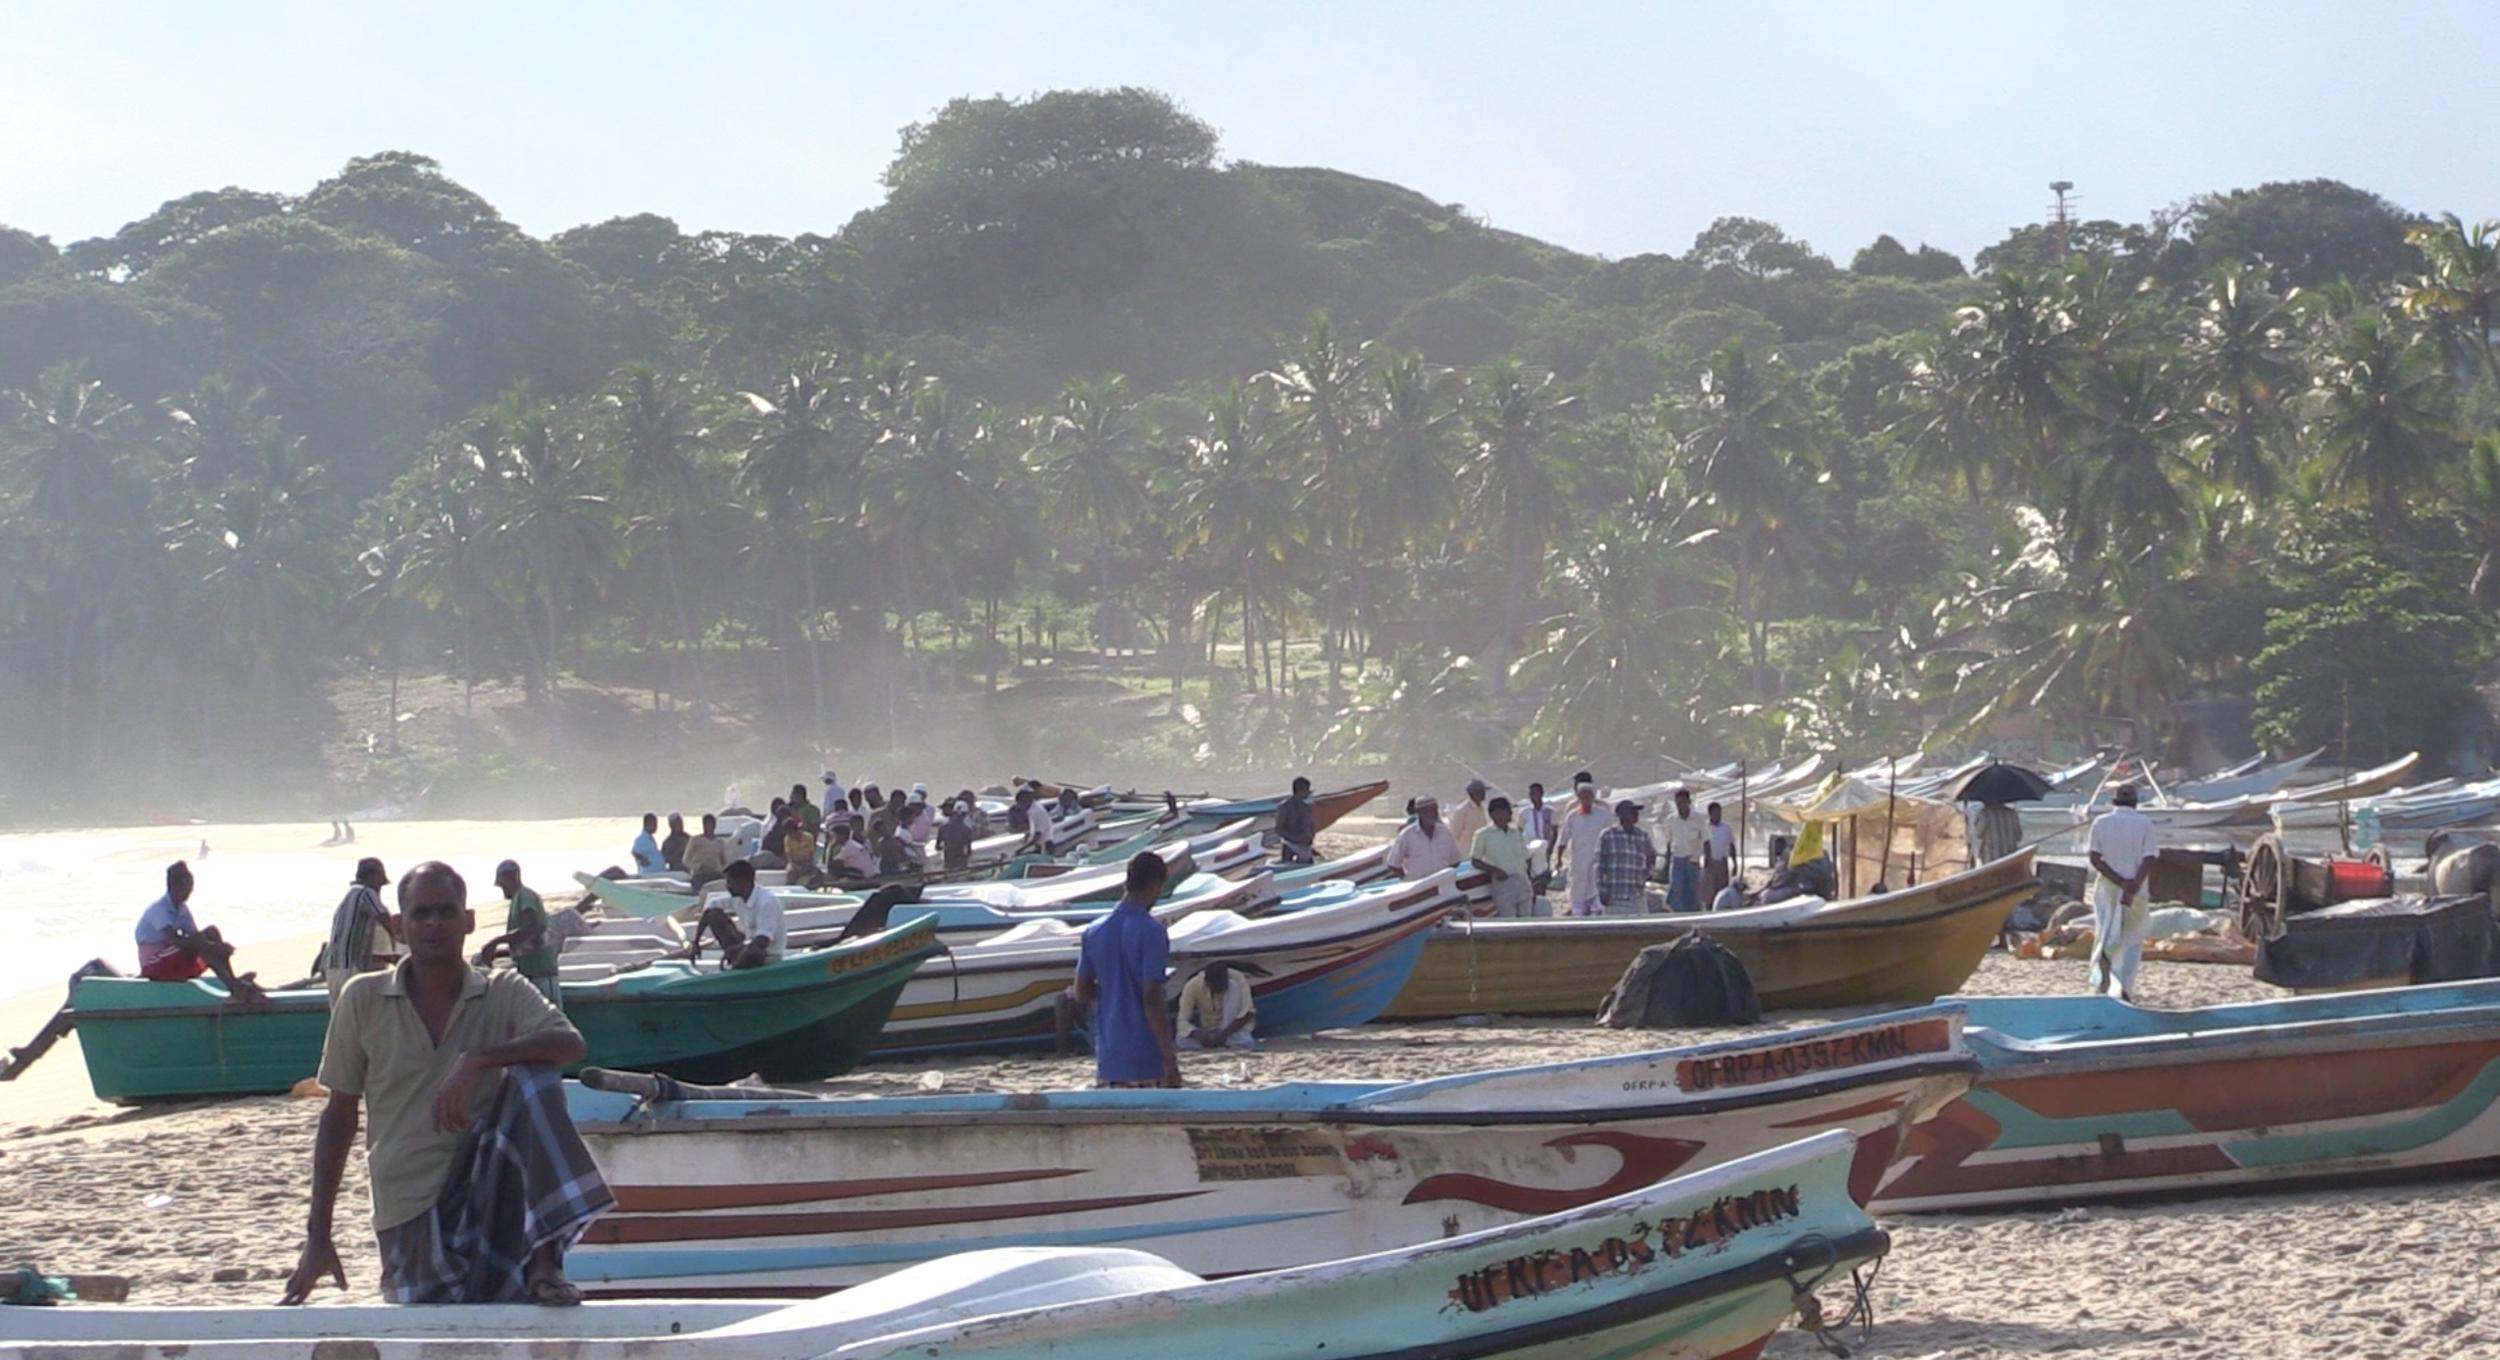 Fishing is tradition at Arugam Bay